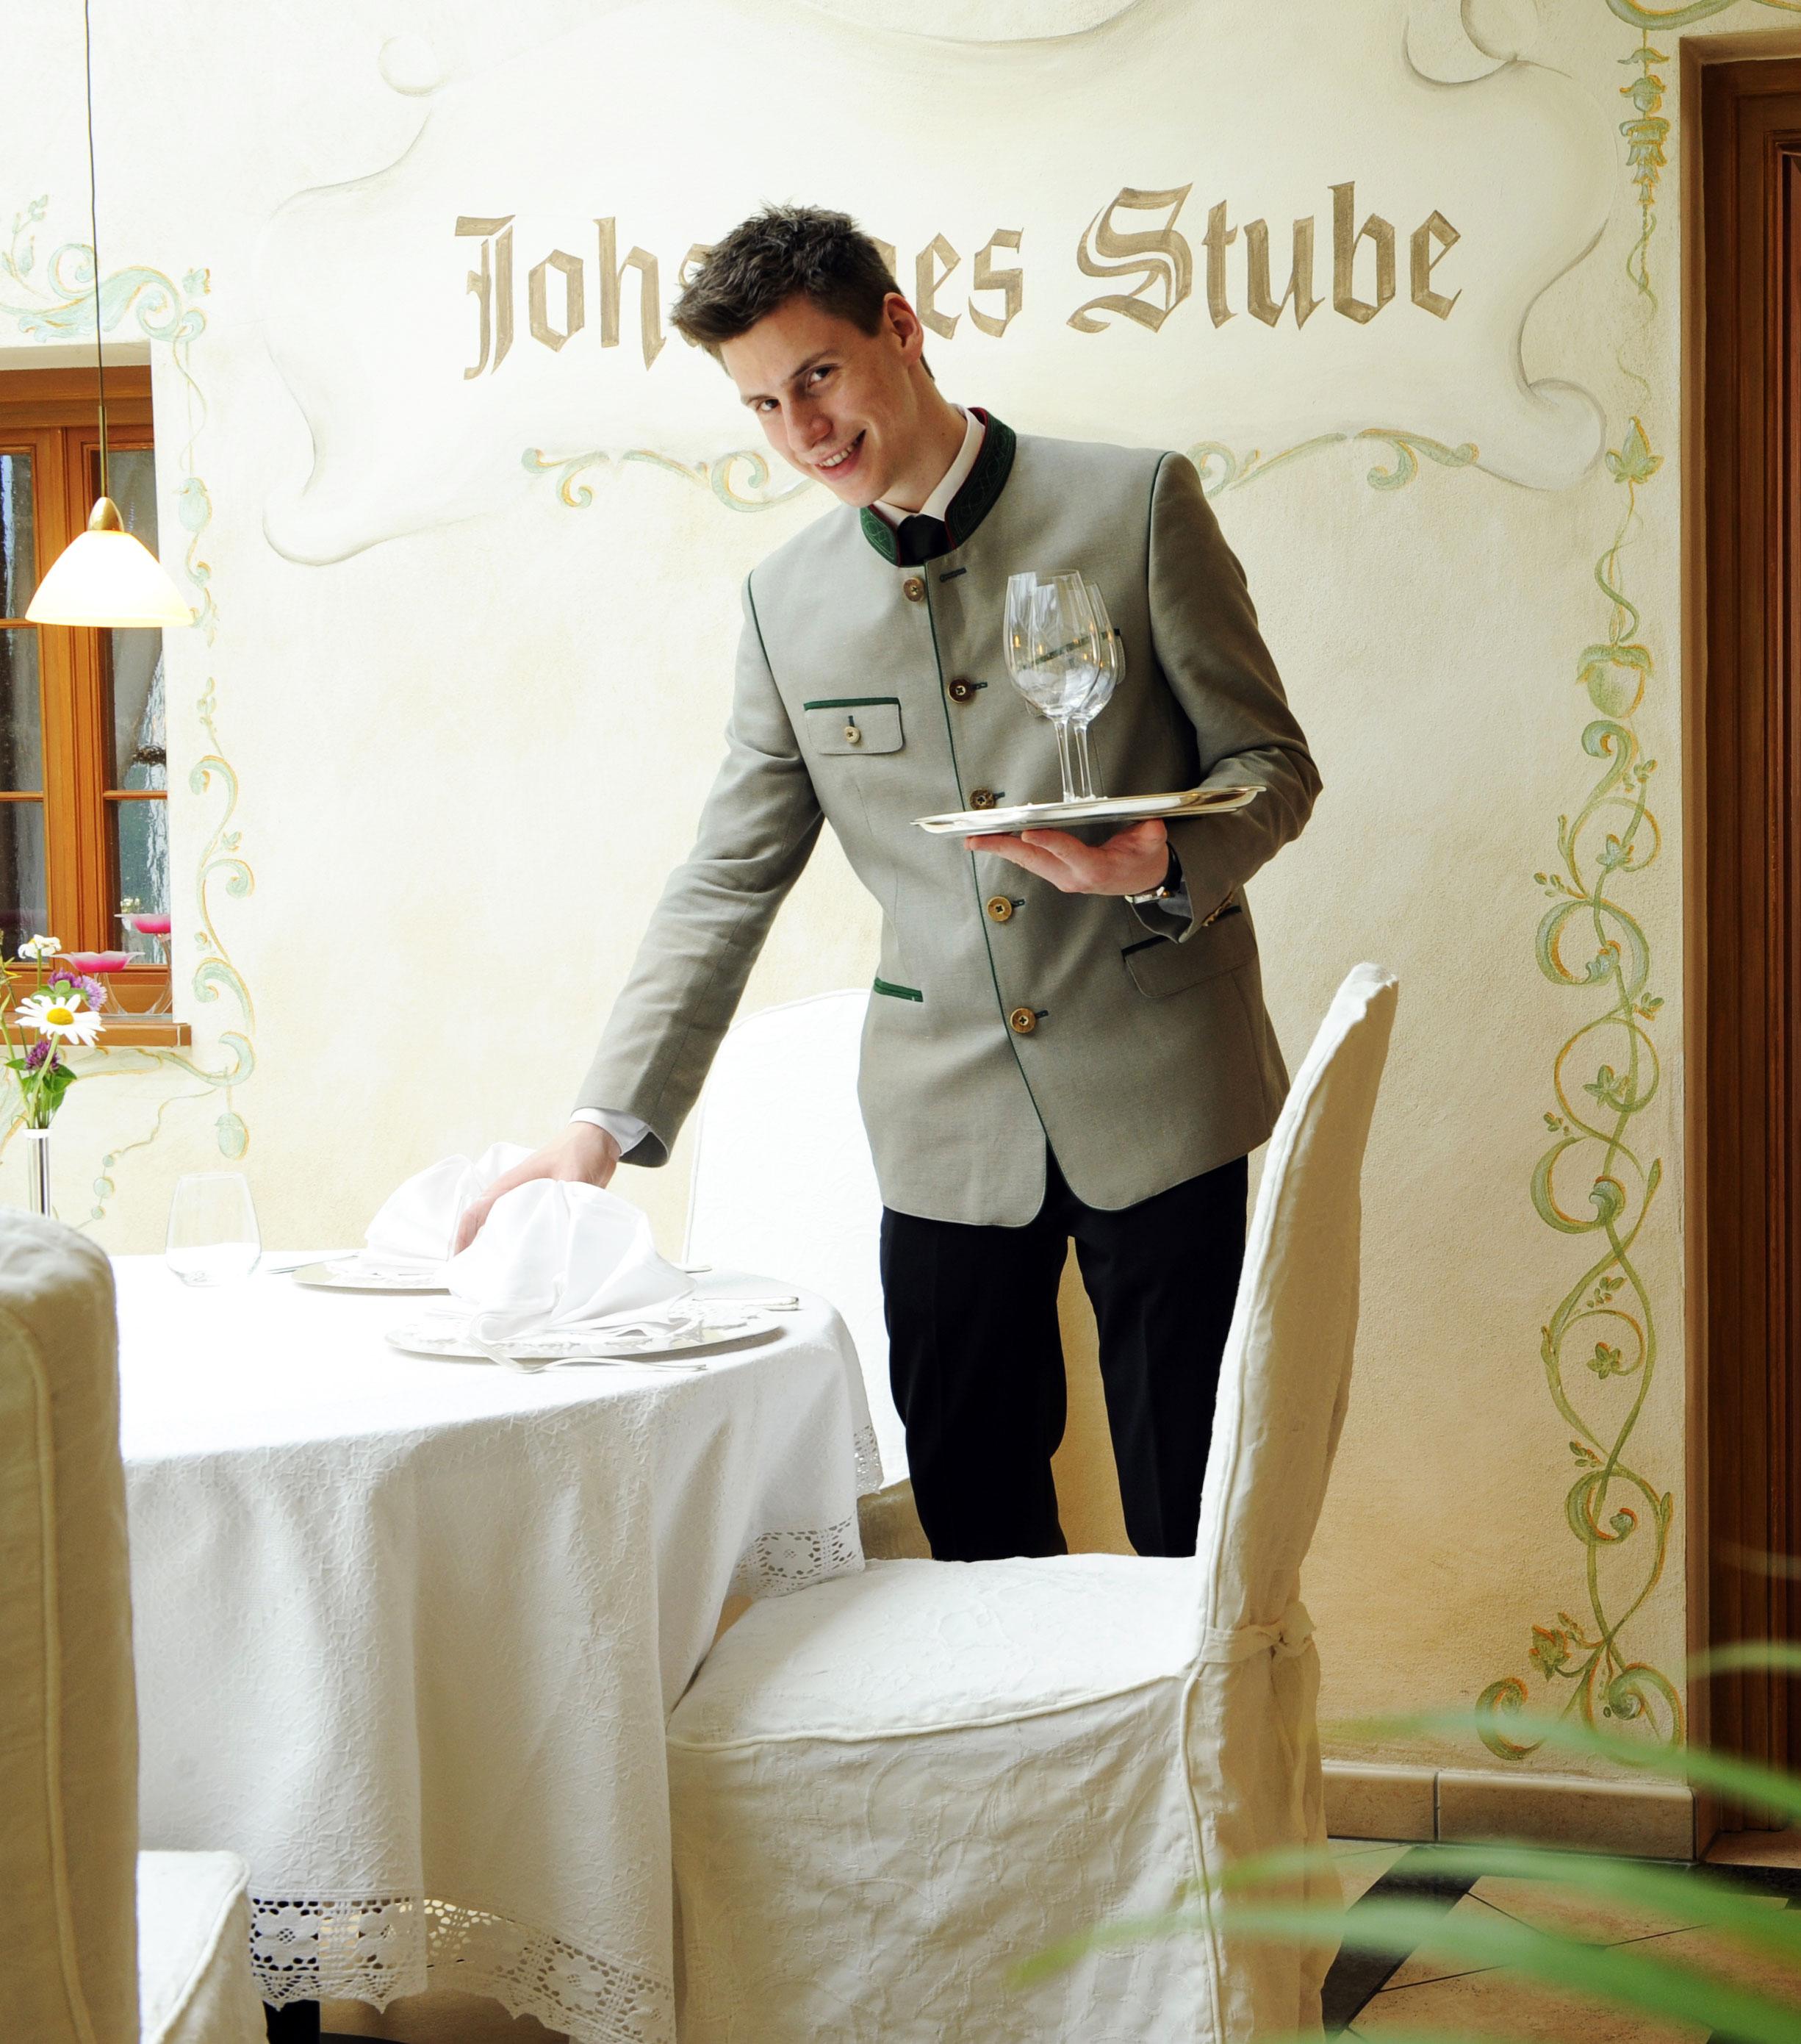 Dans la cave de Johannes Kohler, sommelier du Wellness Hotel Engel Gourmet & Spa